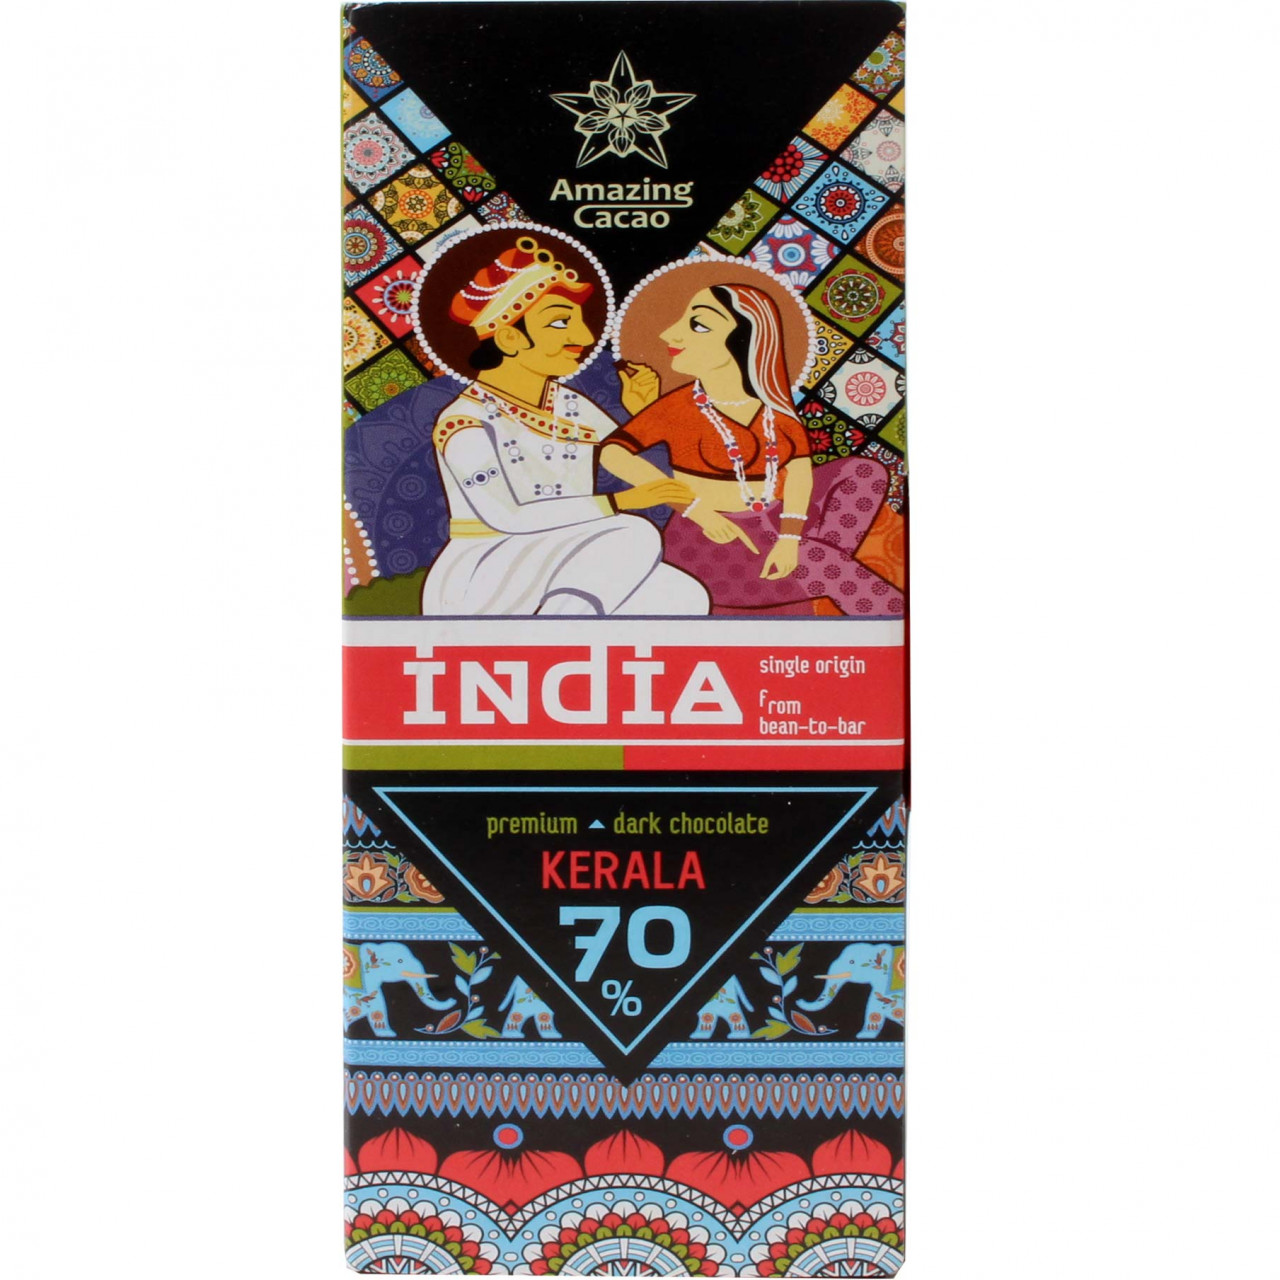 Kerala India 70% dunkle Premium Schokolade - Barras de chocolate, Rusia, chocolate ruso, chocolate puro sin ingredientes - Chocolats-De-Luxe